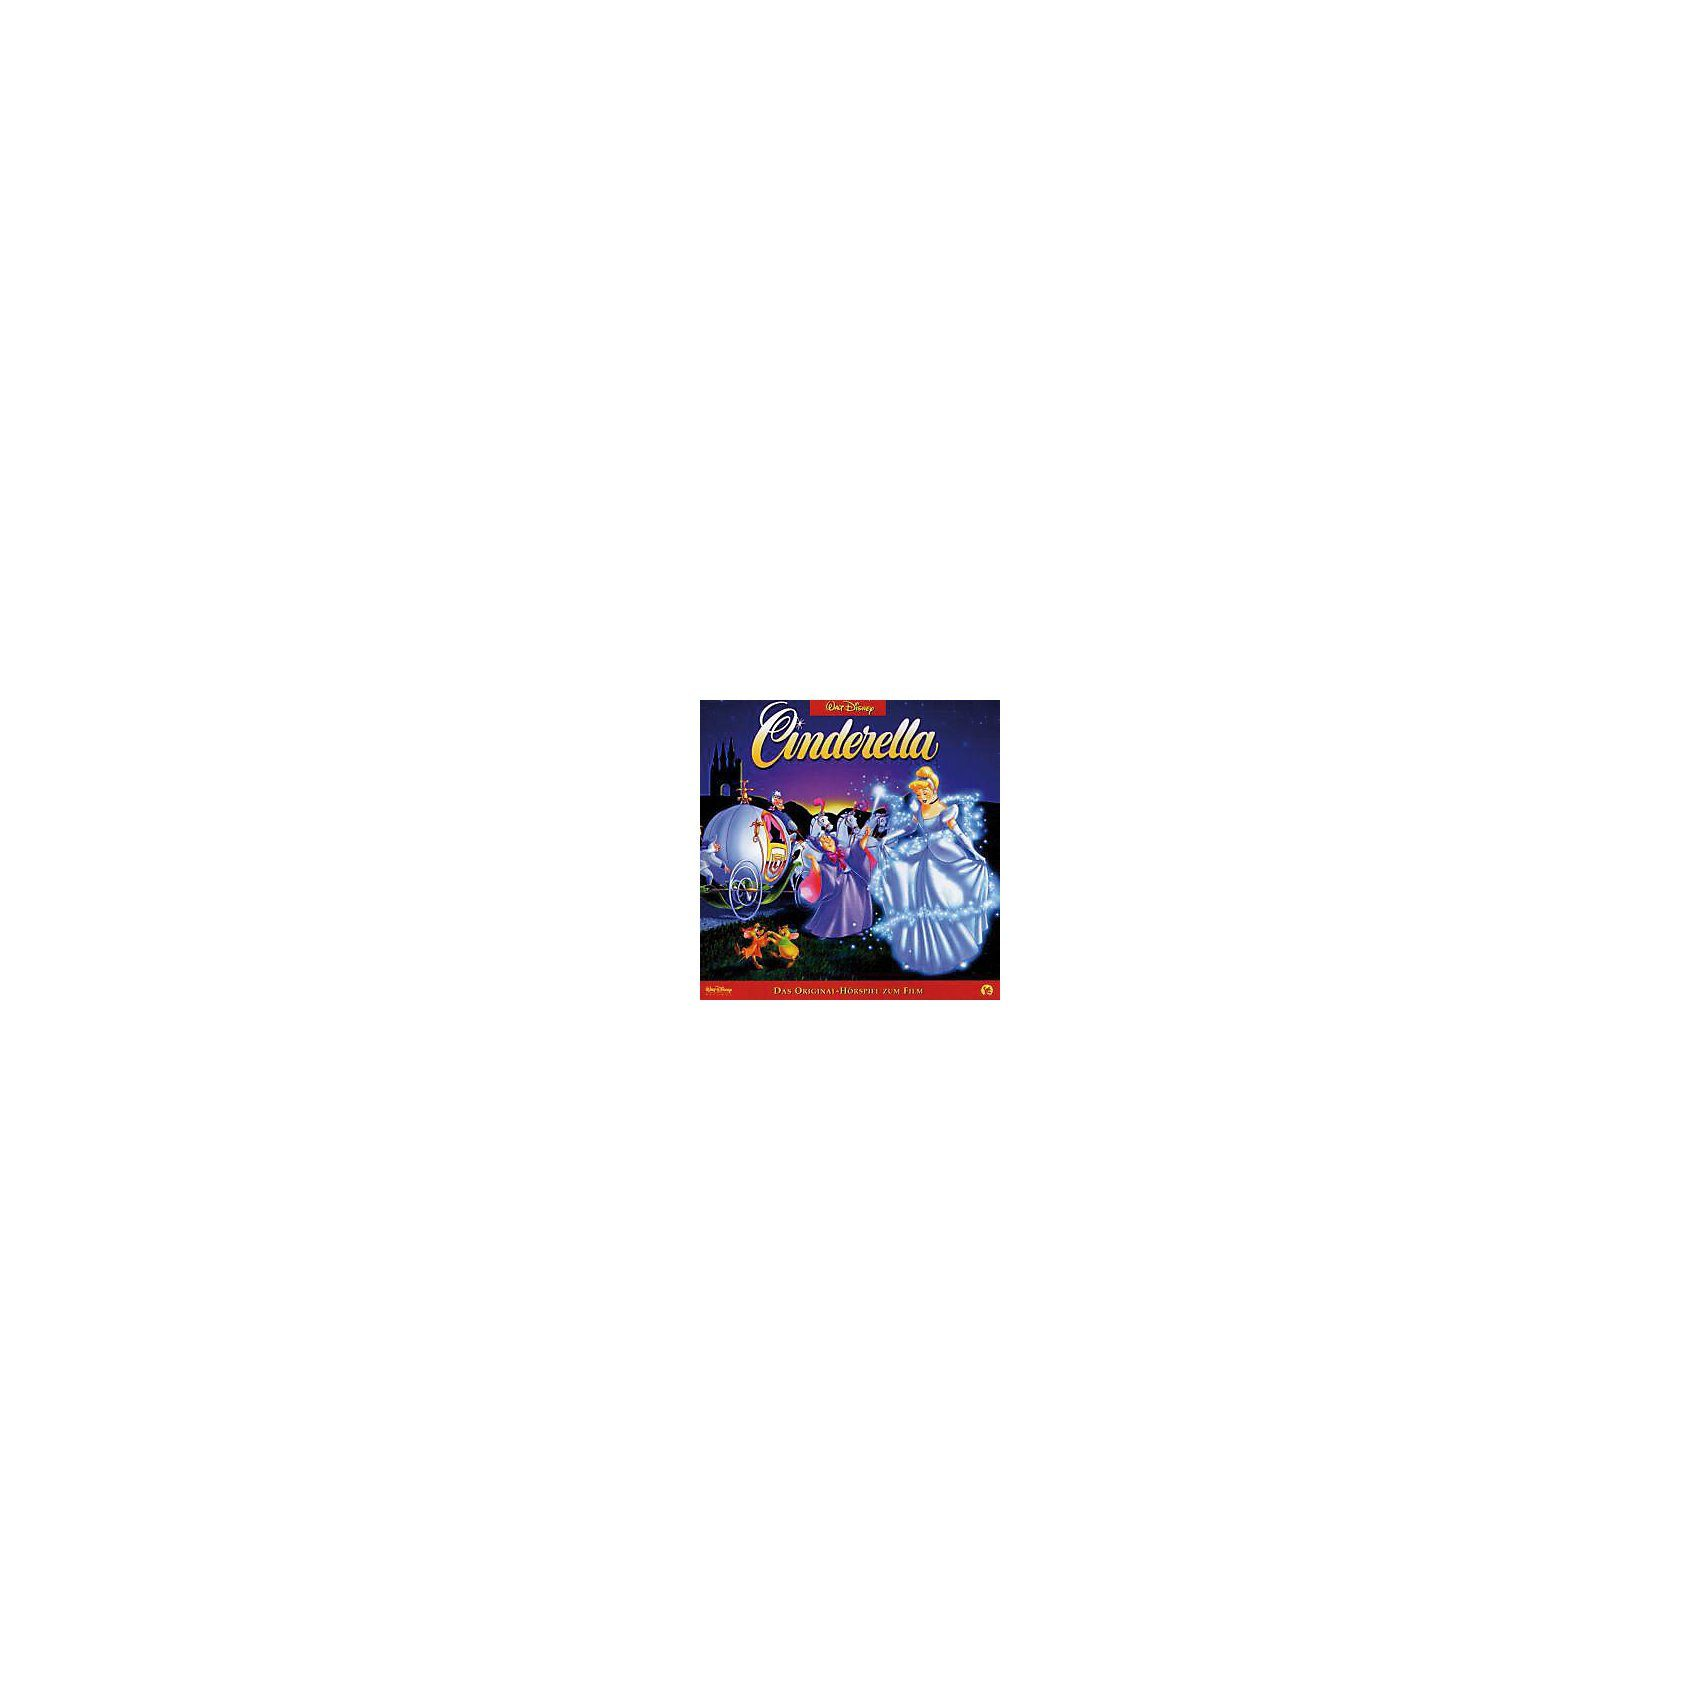 Kiddinx CD Disneys Cinderella (Original-Hörspiel zum Film)